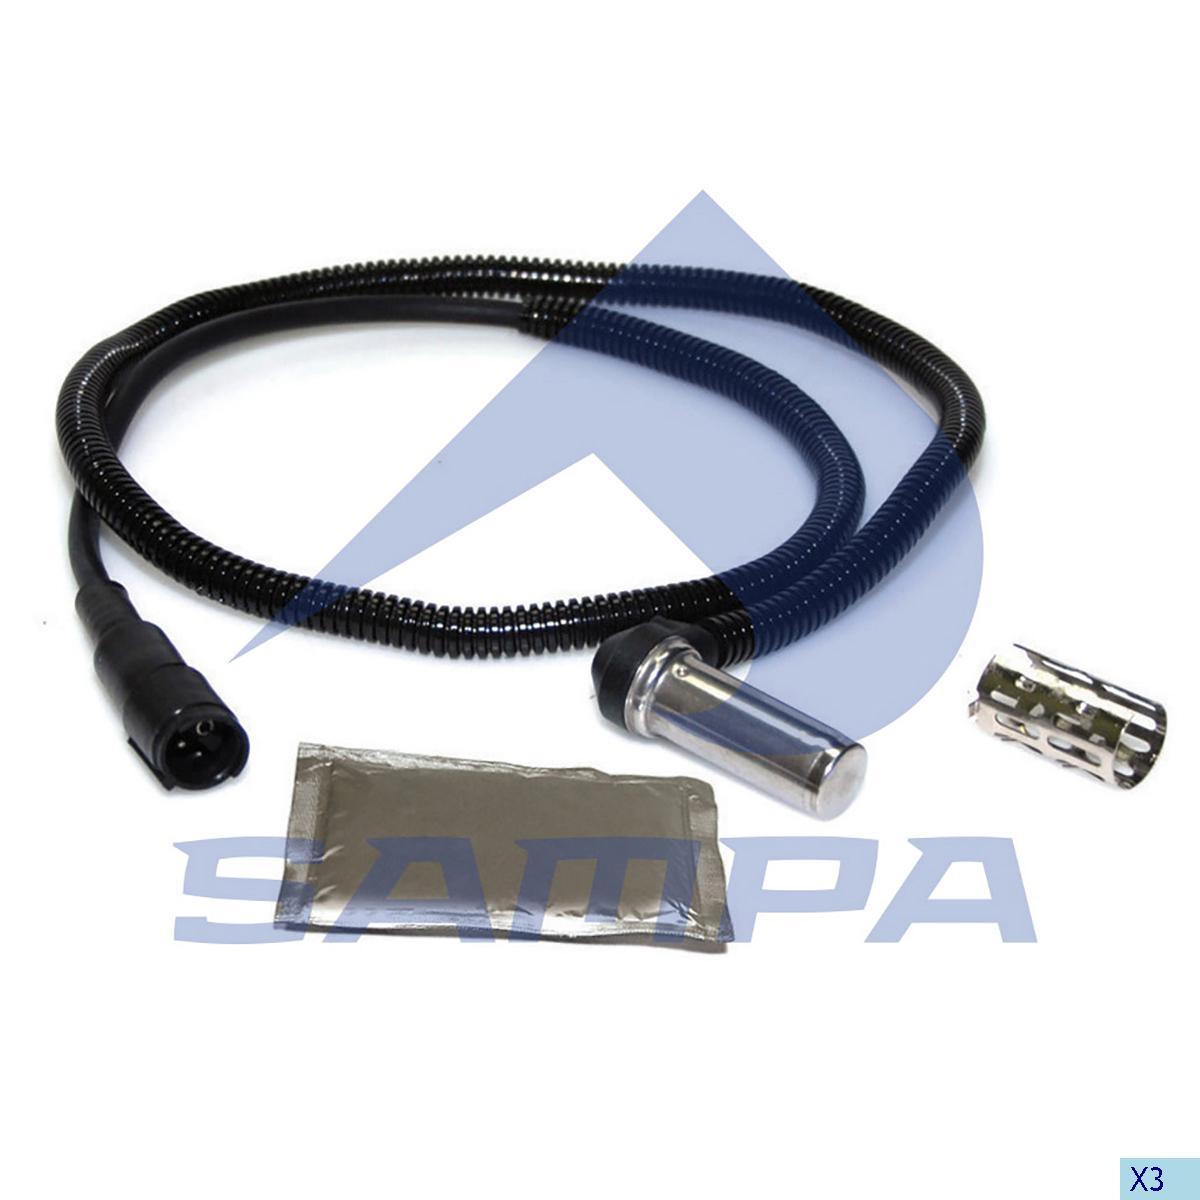 Sensor, ABS, Scania, Brake